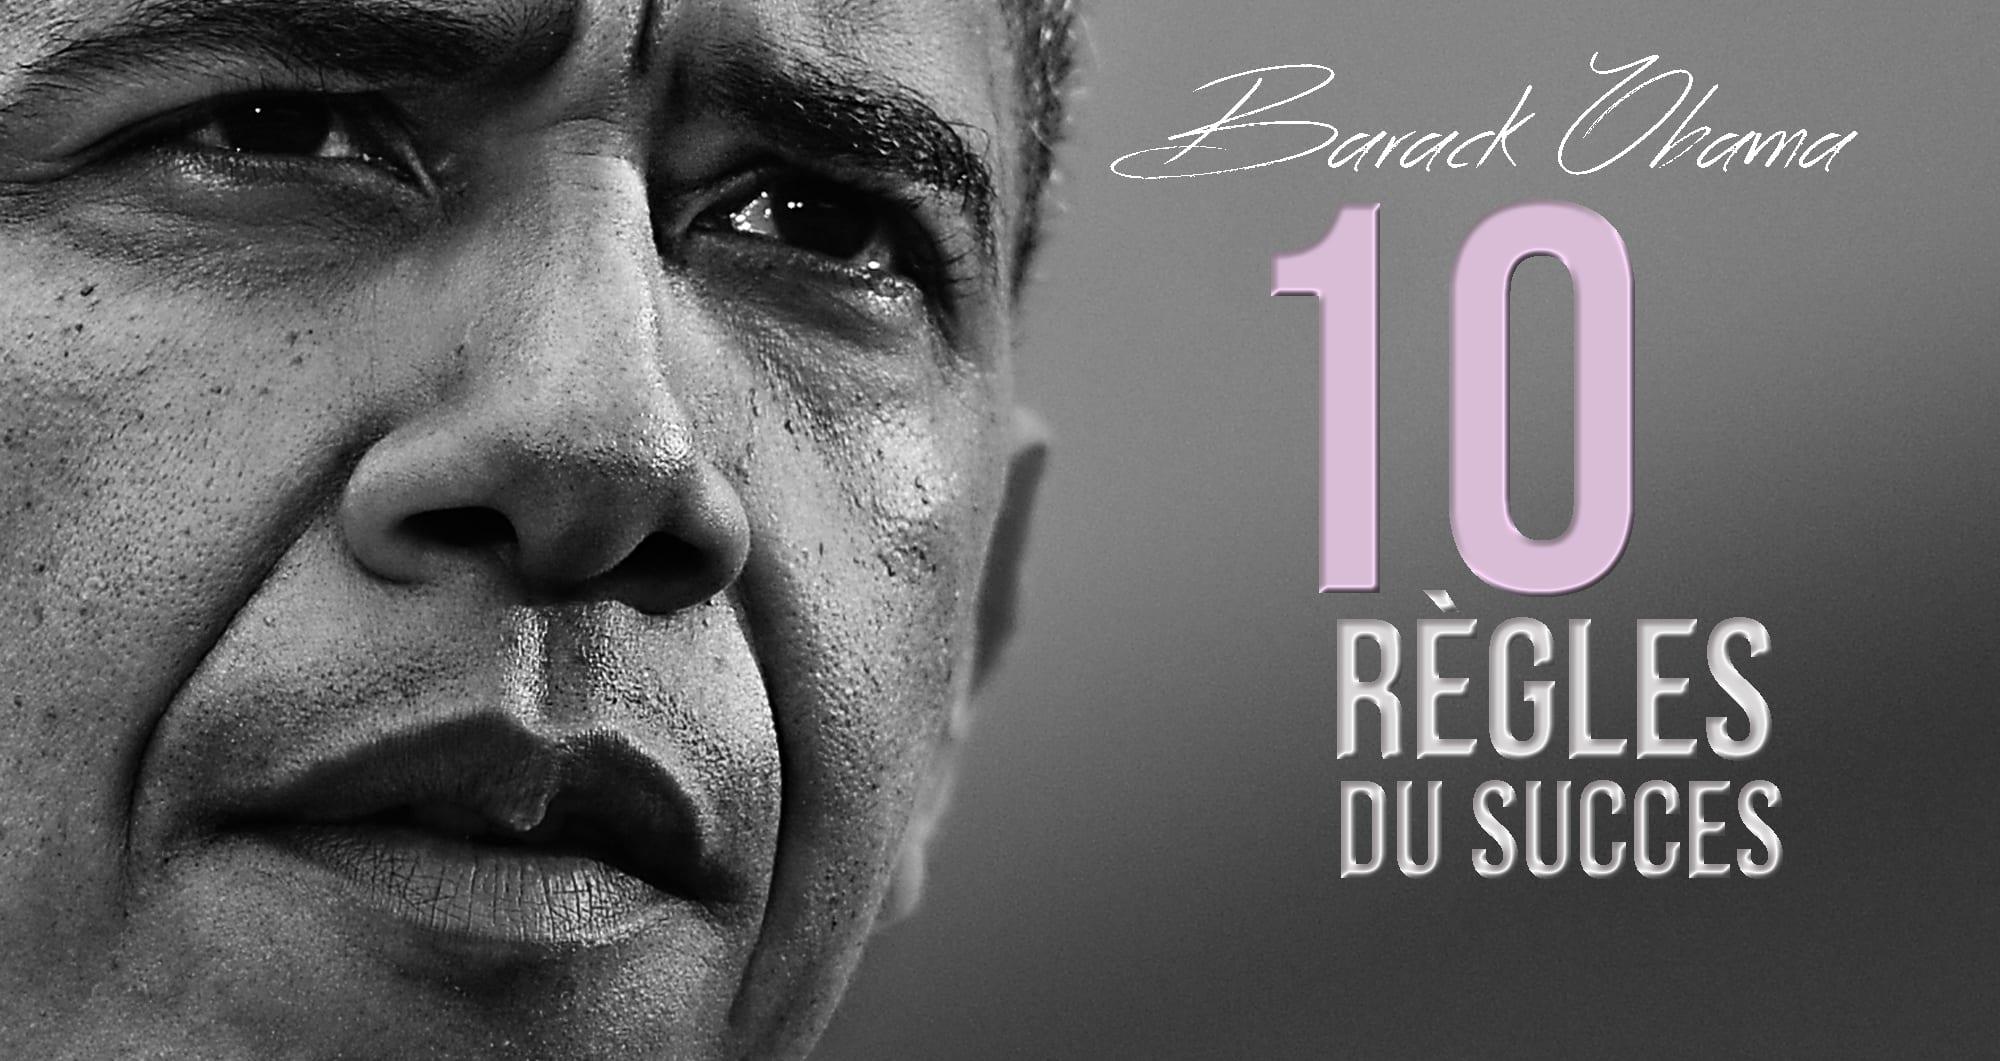 Les 10 règles de succès de Barack Obama